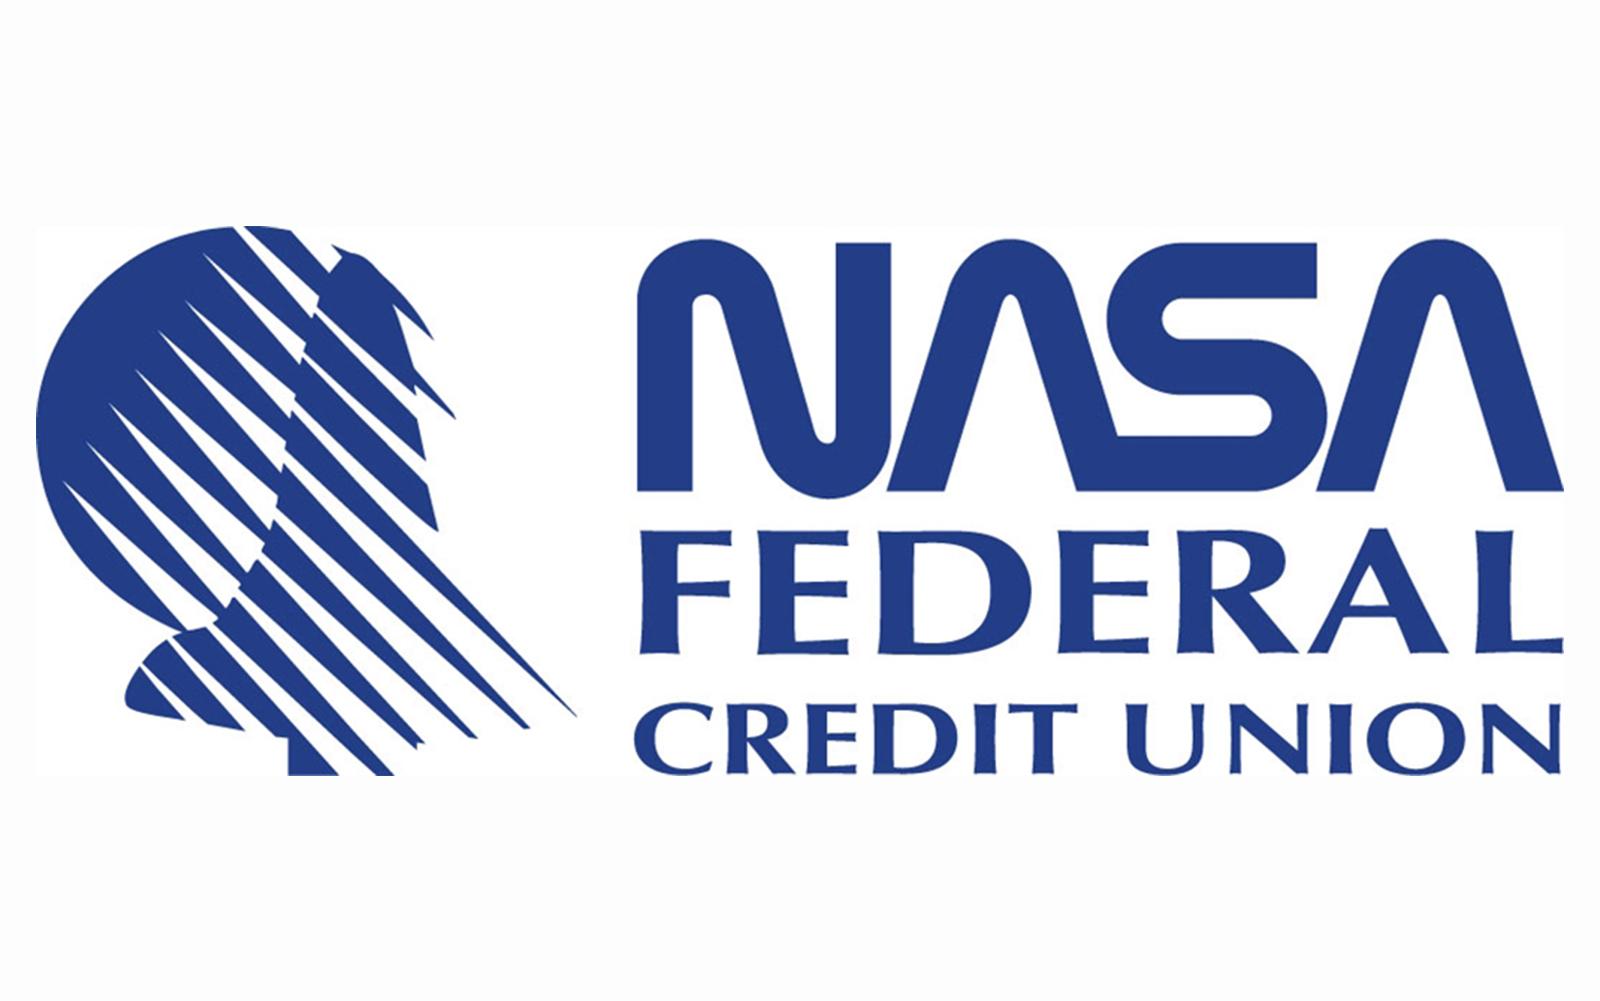 Northrop Grumman Credit Union >> Northrop Grumman Federal Credit Union Assassins Creed Iv Game